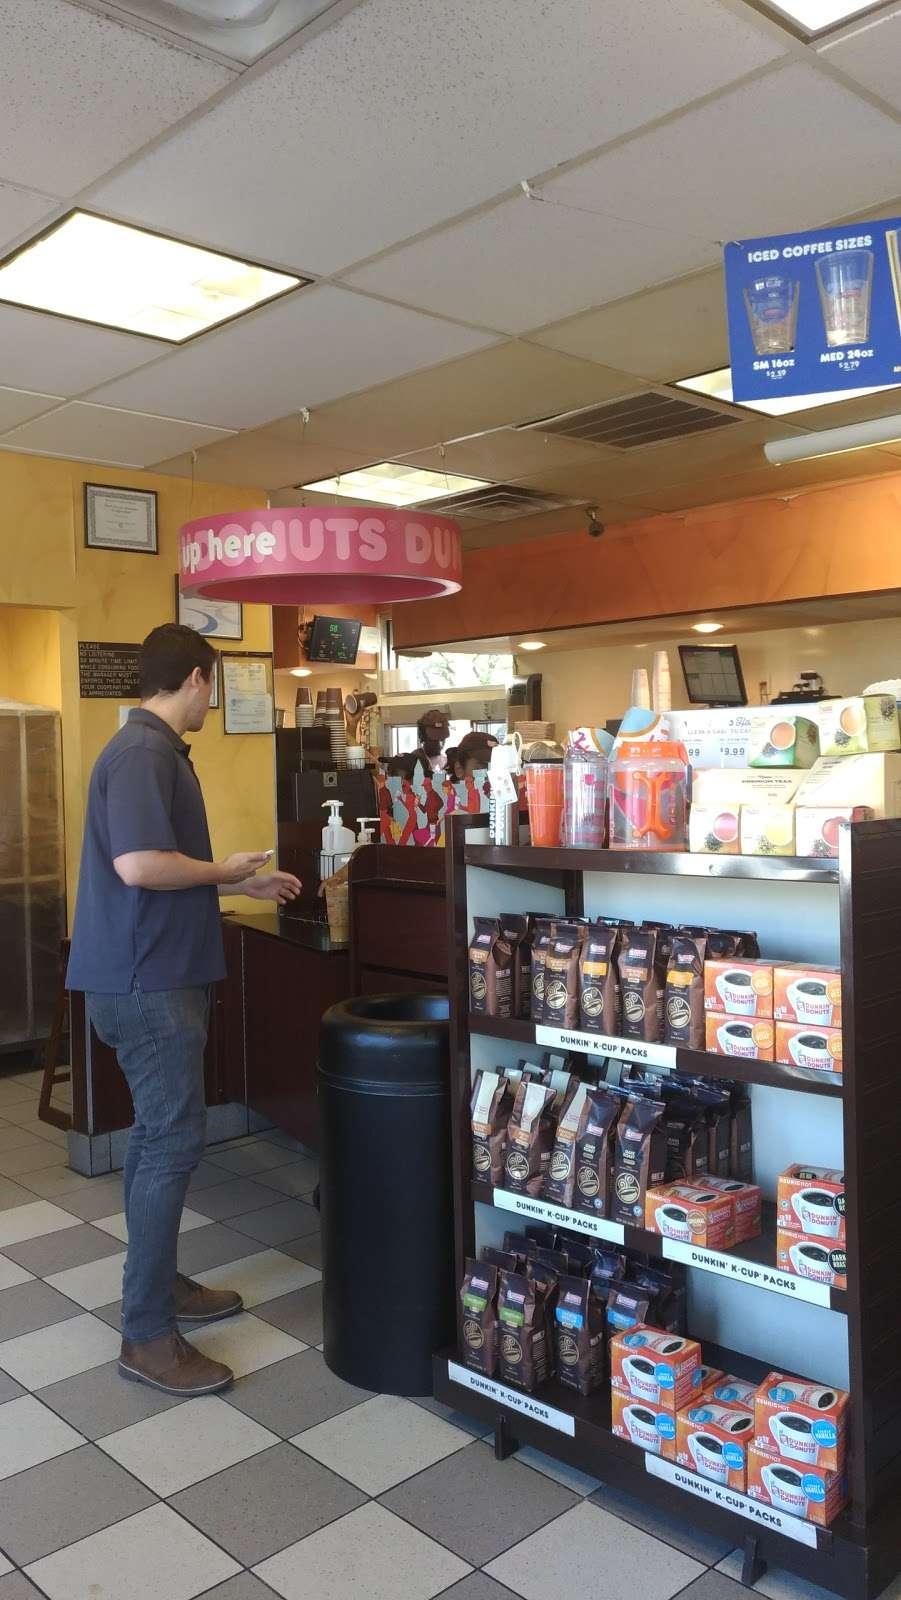 Dunkin Donuts - cafe  | Photo 6 of 10 | Address: 402 Grand St #436, Jersey City, NJ 07302, USA | Phone: (201) 309-0777